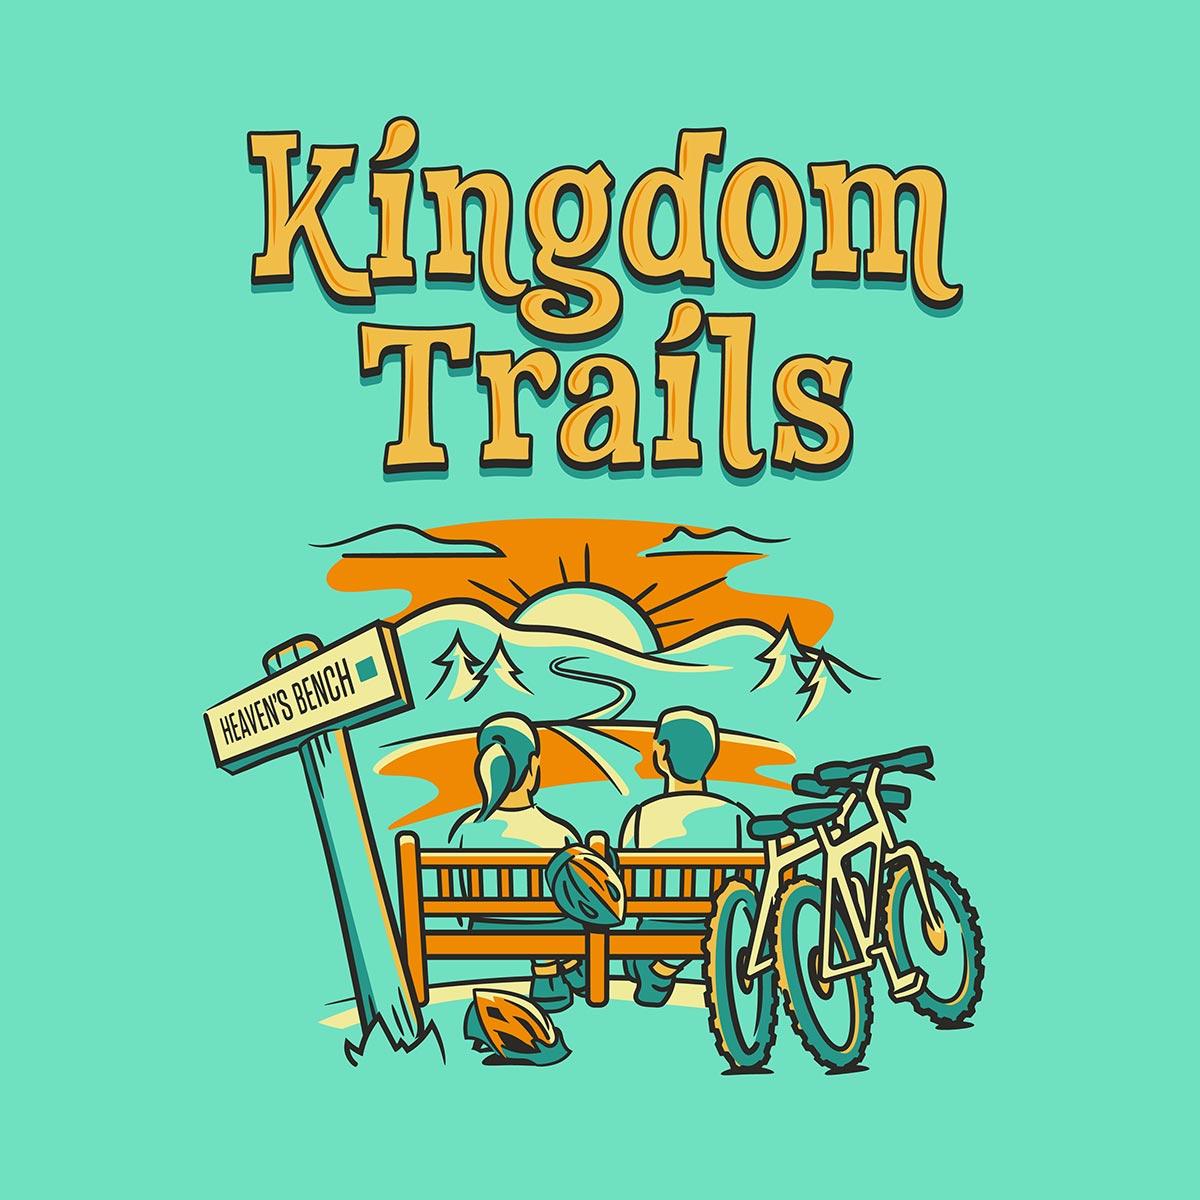 Kingdom Trails IPA